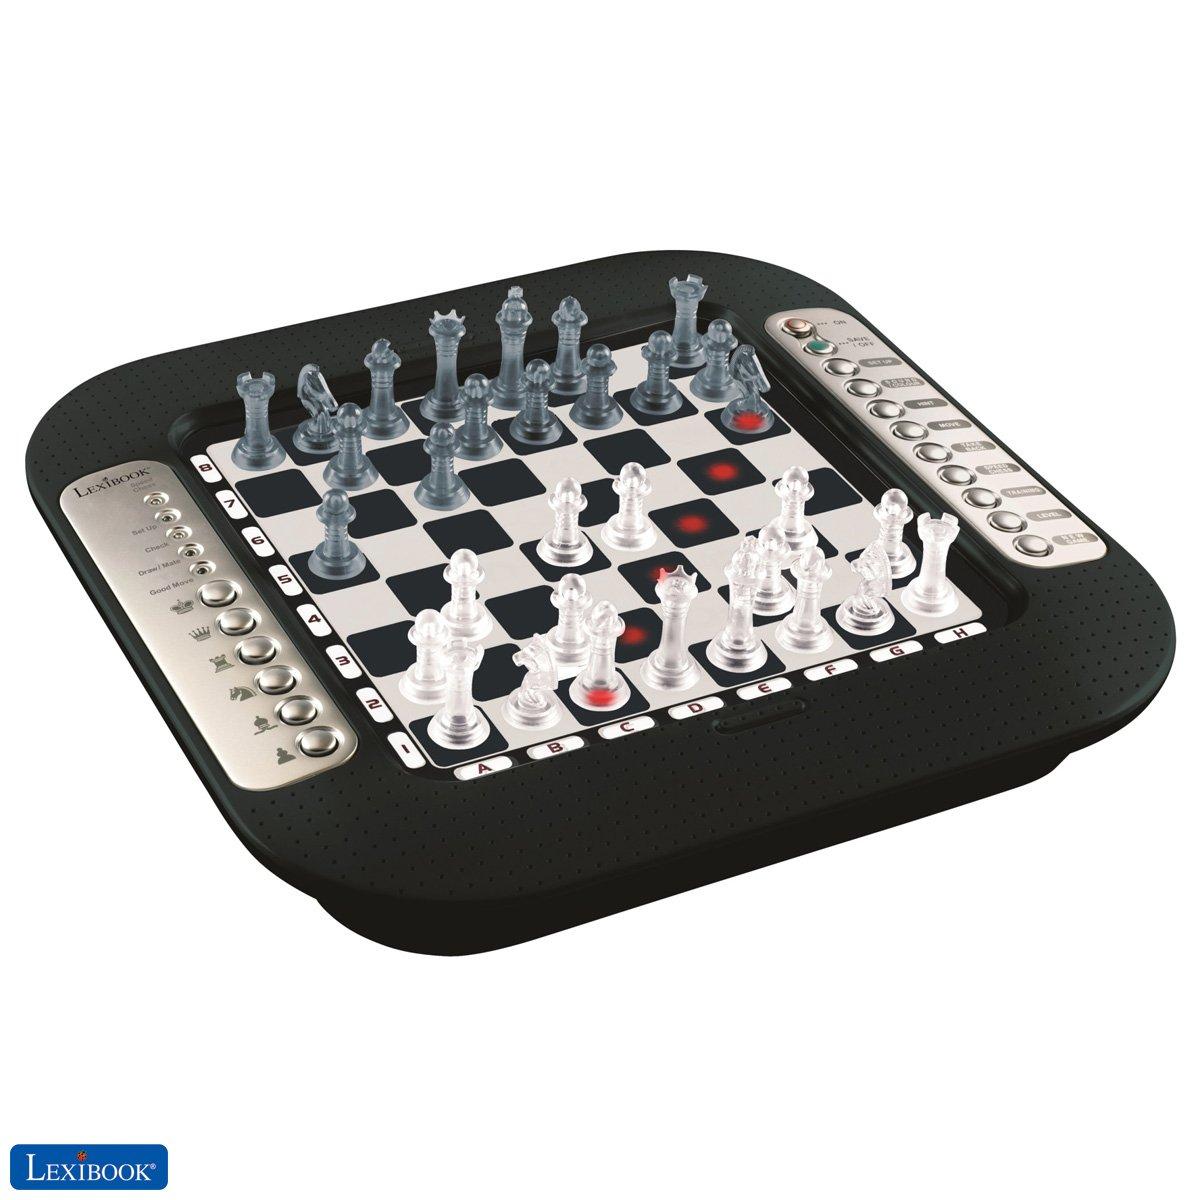 Lexibook - ChessMan FX electronic chess game (CG1335)